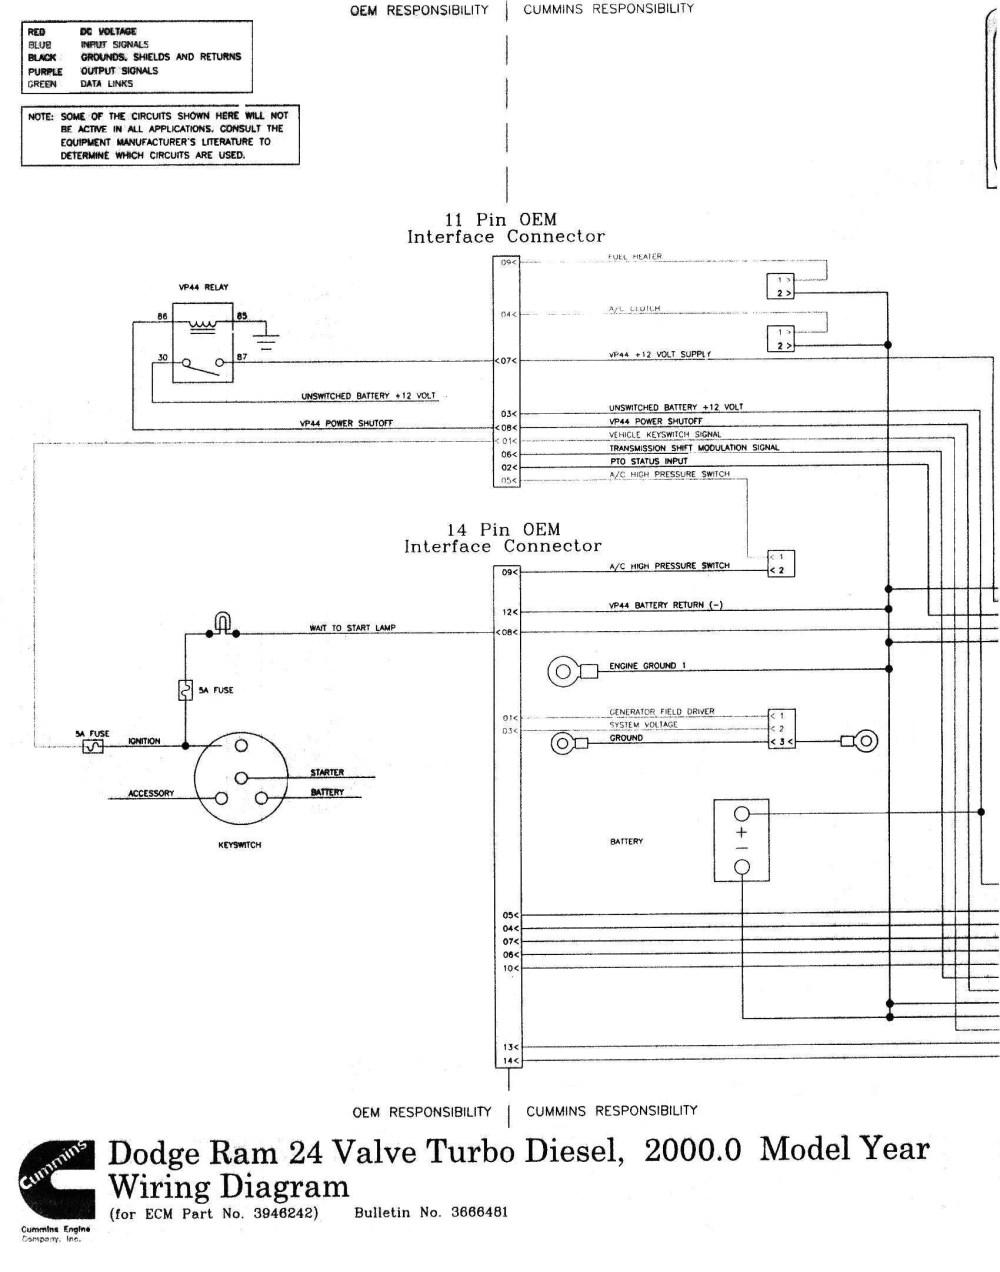 medium resolution of diesel engine fuel system diagram dodge cummins diesel fuel line diagram dodge obd connector wiring